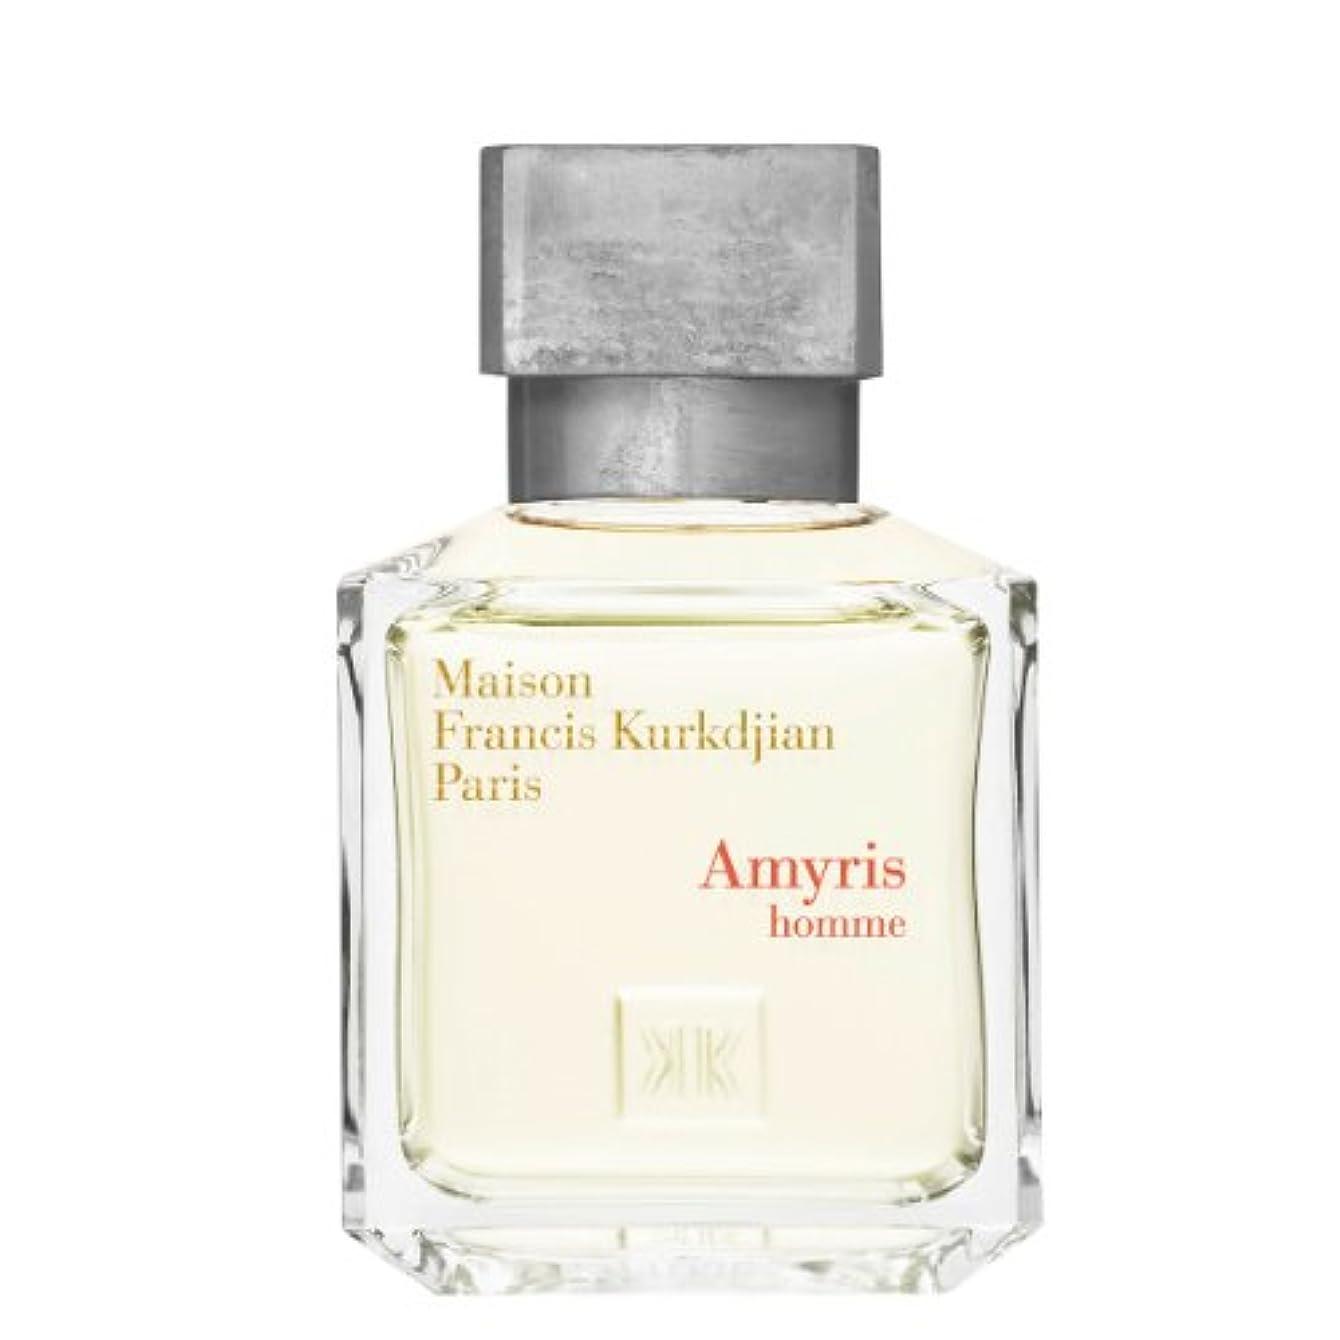 Amyris Homme by Maison Francis Kurkdjian Eau De Toilette Spray 2.4 oz / 71 ml (Men)